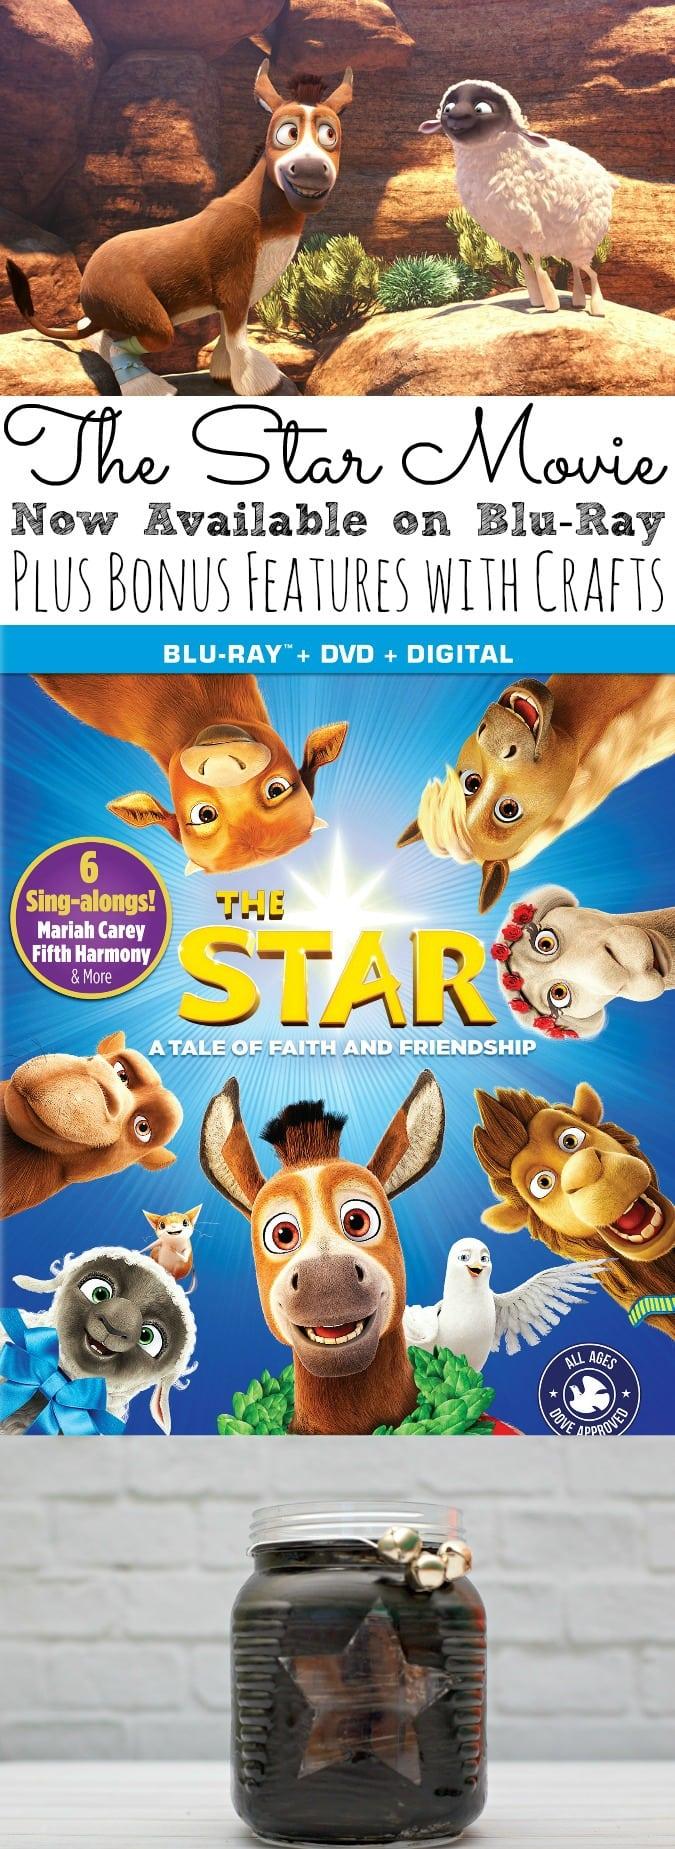 The Star Movie Now On Blu-Ray + Craft - simplytodaylife.com